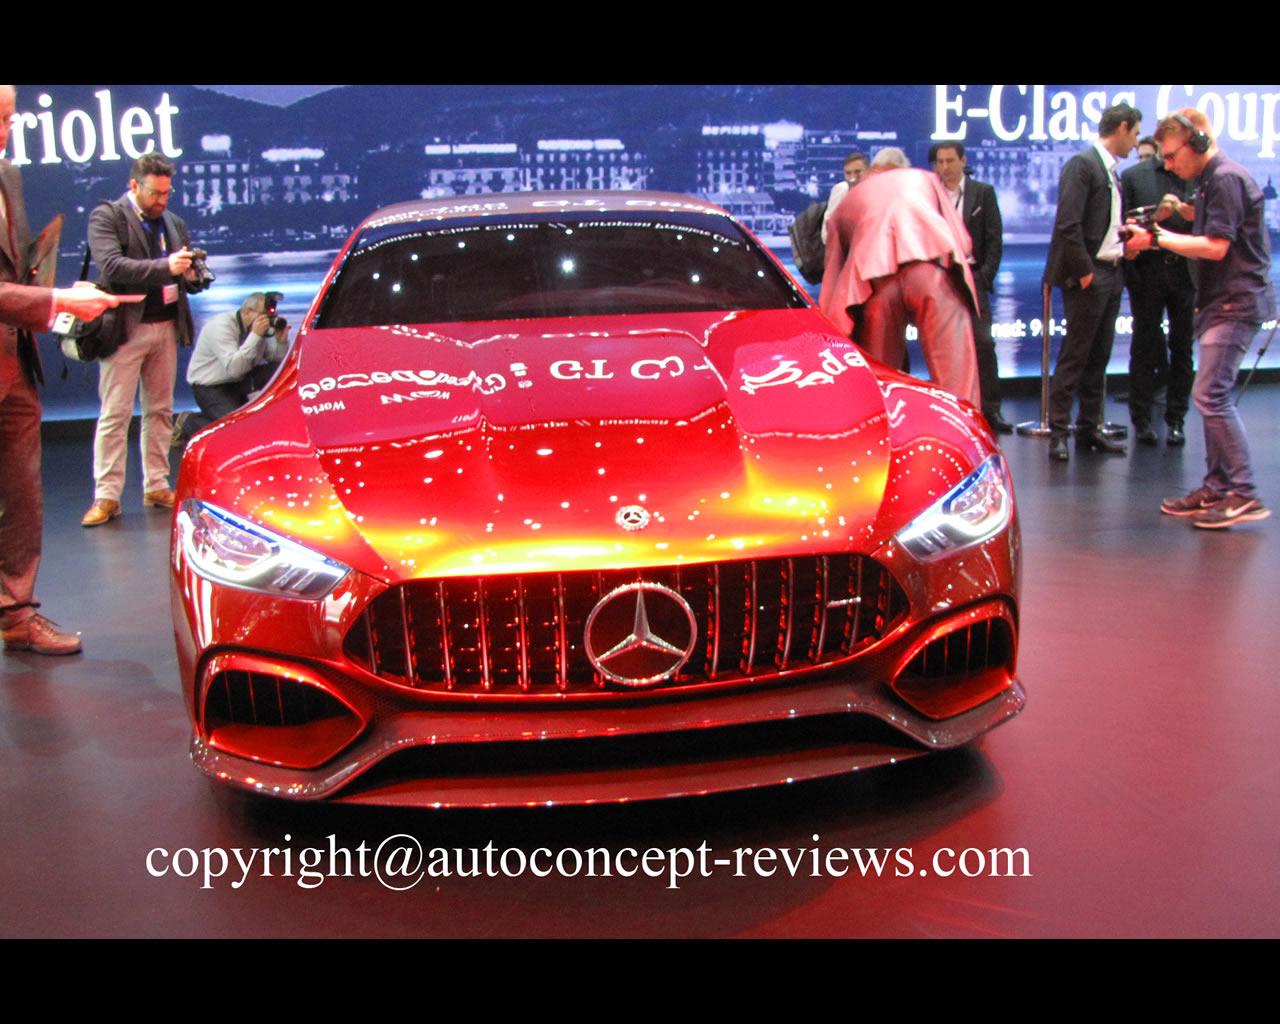 http://www.autoconcept-reviews.com/cars_reviews/mercedes/mercedes-benz-amg-gt-hybrid-concept-2017/wallpapers/1-Mercedes%20Benz%20AMG%20GT%20Concept%20%20-%20Geneve%202017%20-IMG_4583.jpg